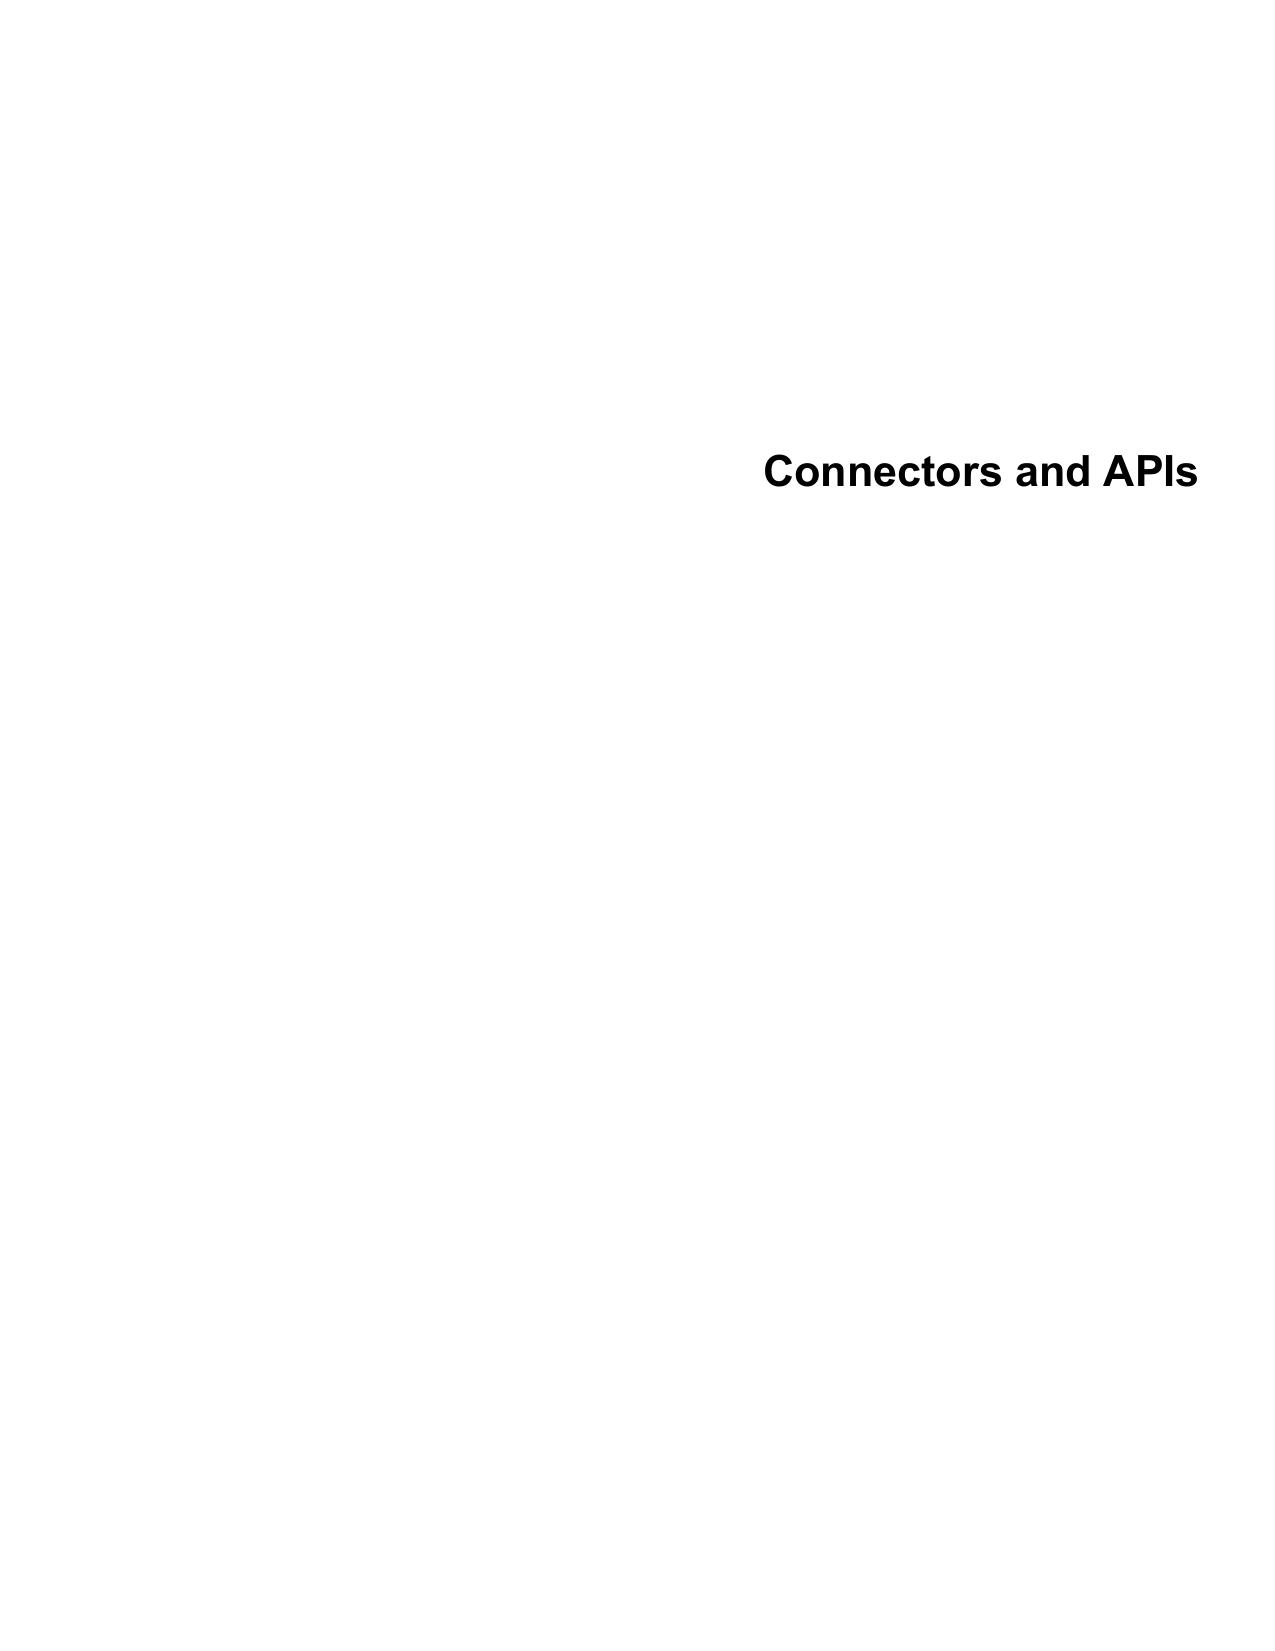 Connectors and APIs - Downloads | manualzz com